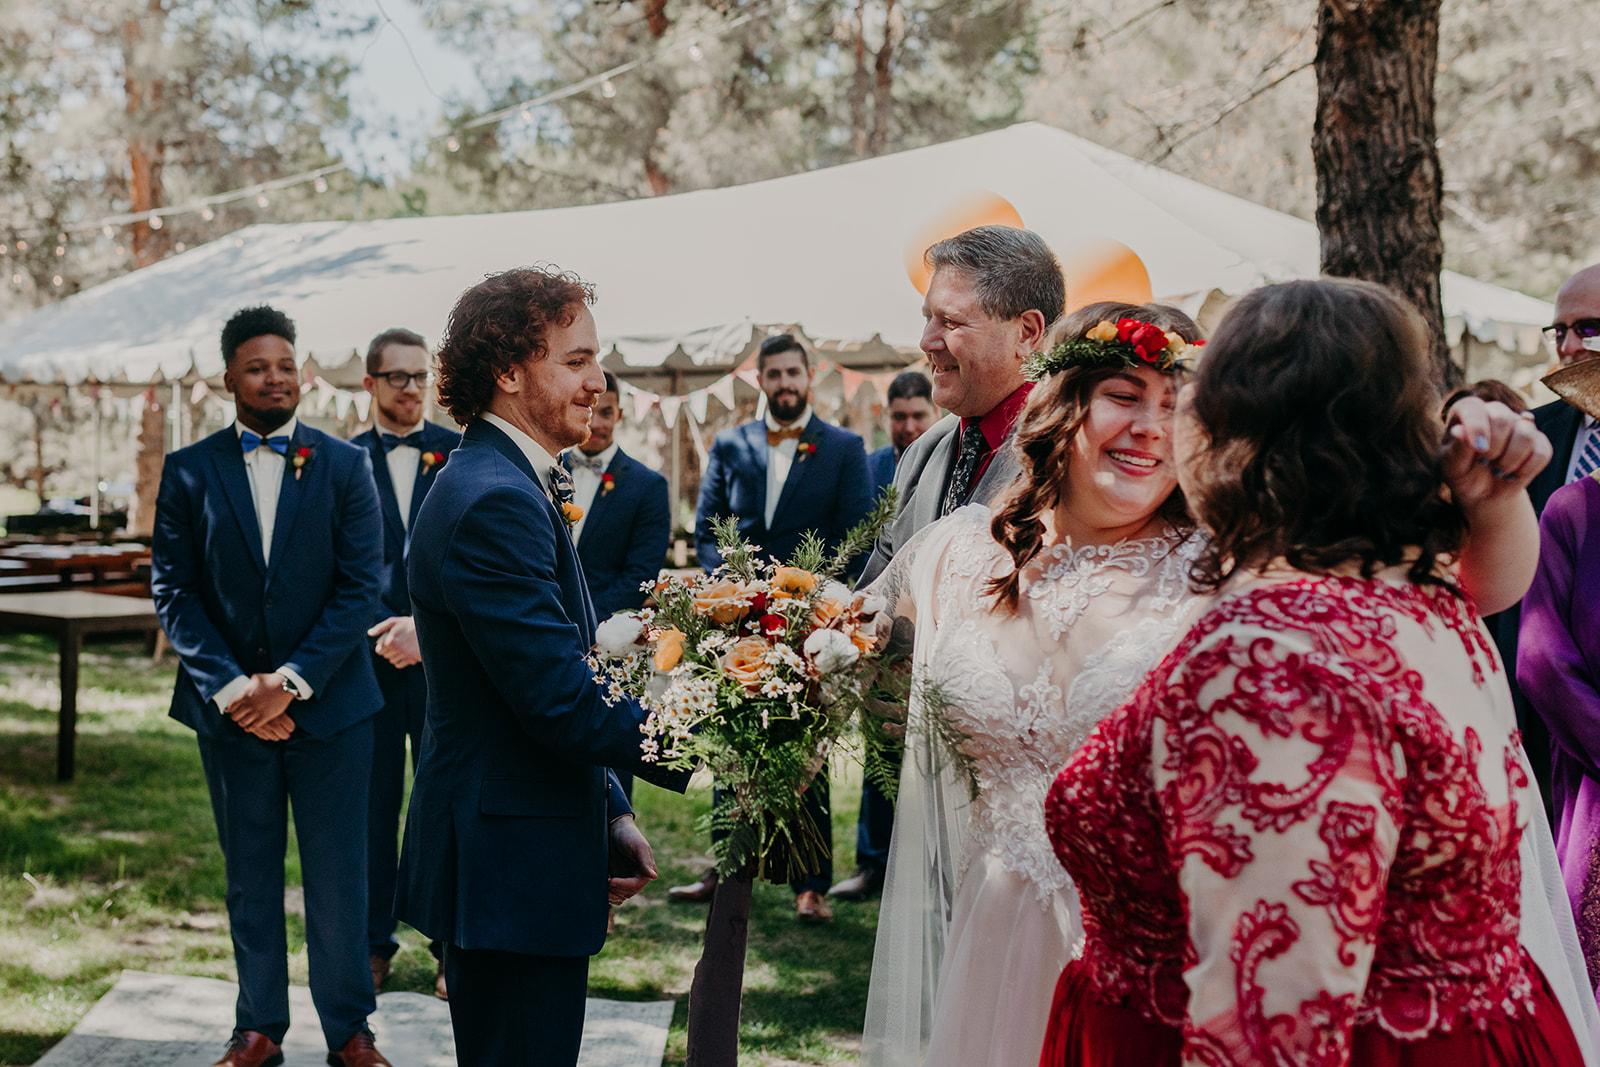 Disney Themed Wedding - Arizona florist Phoenix scottsdale Mesa chandler Sedona Flagstaff Prescott - Ceremony Family Photos